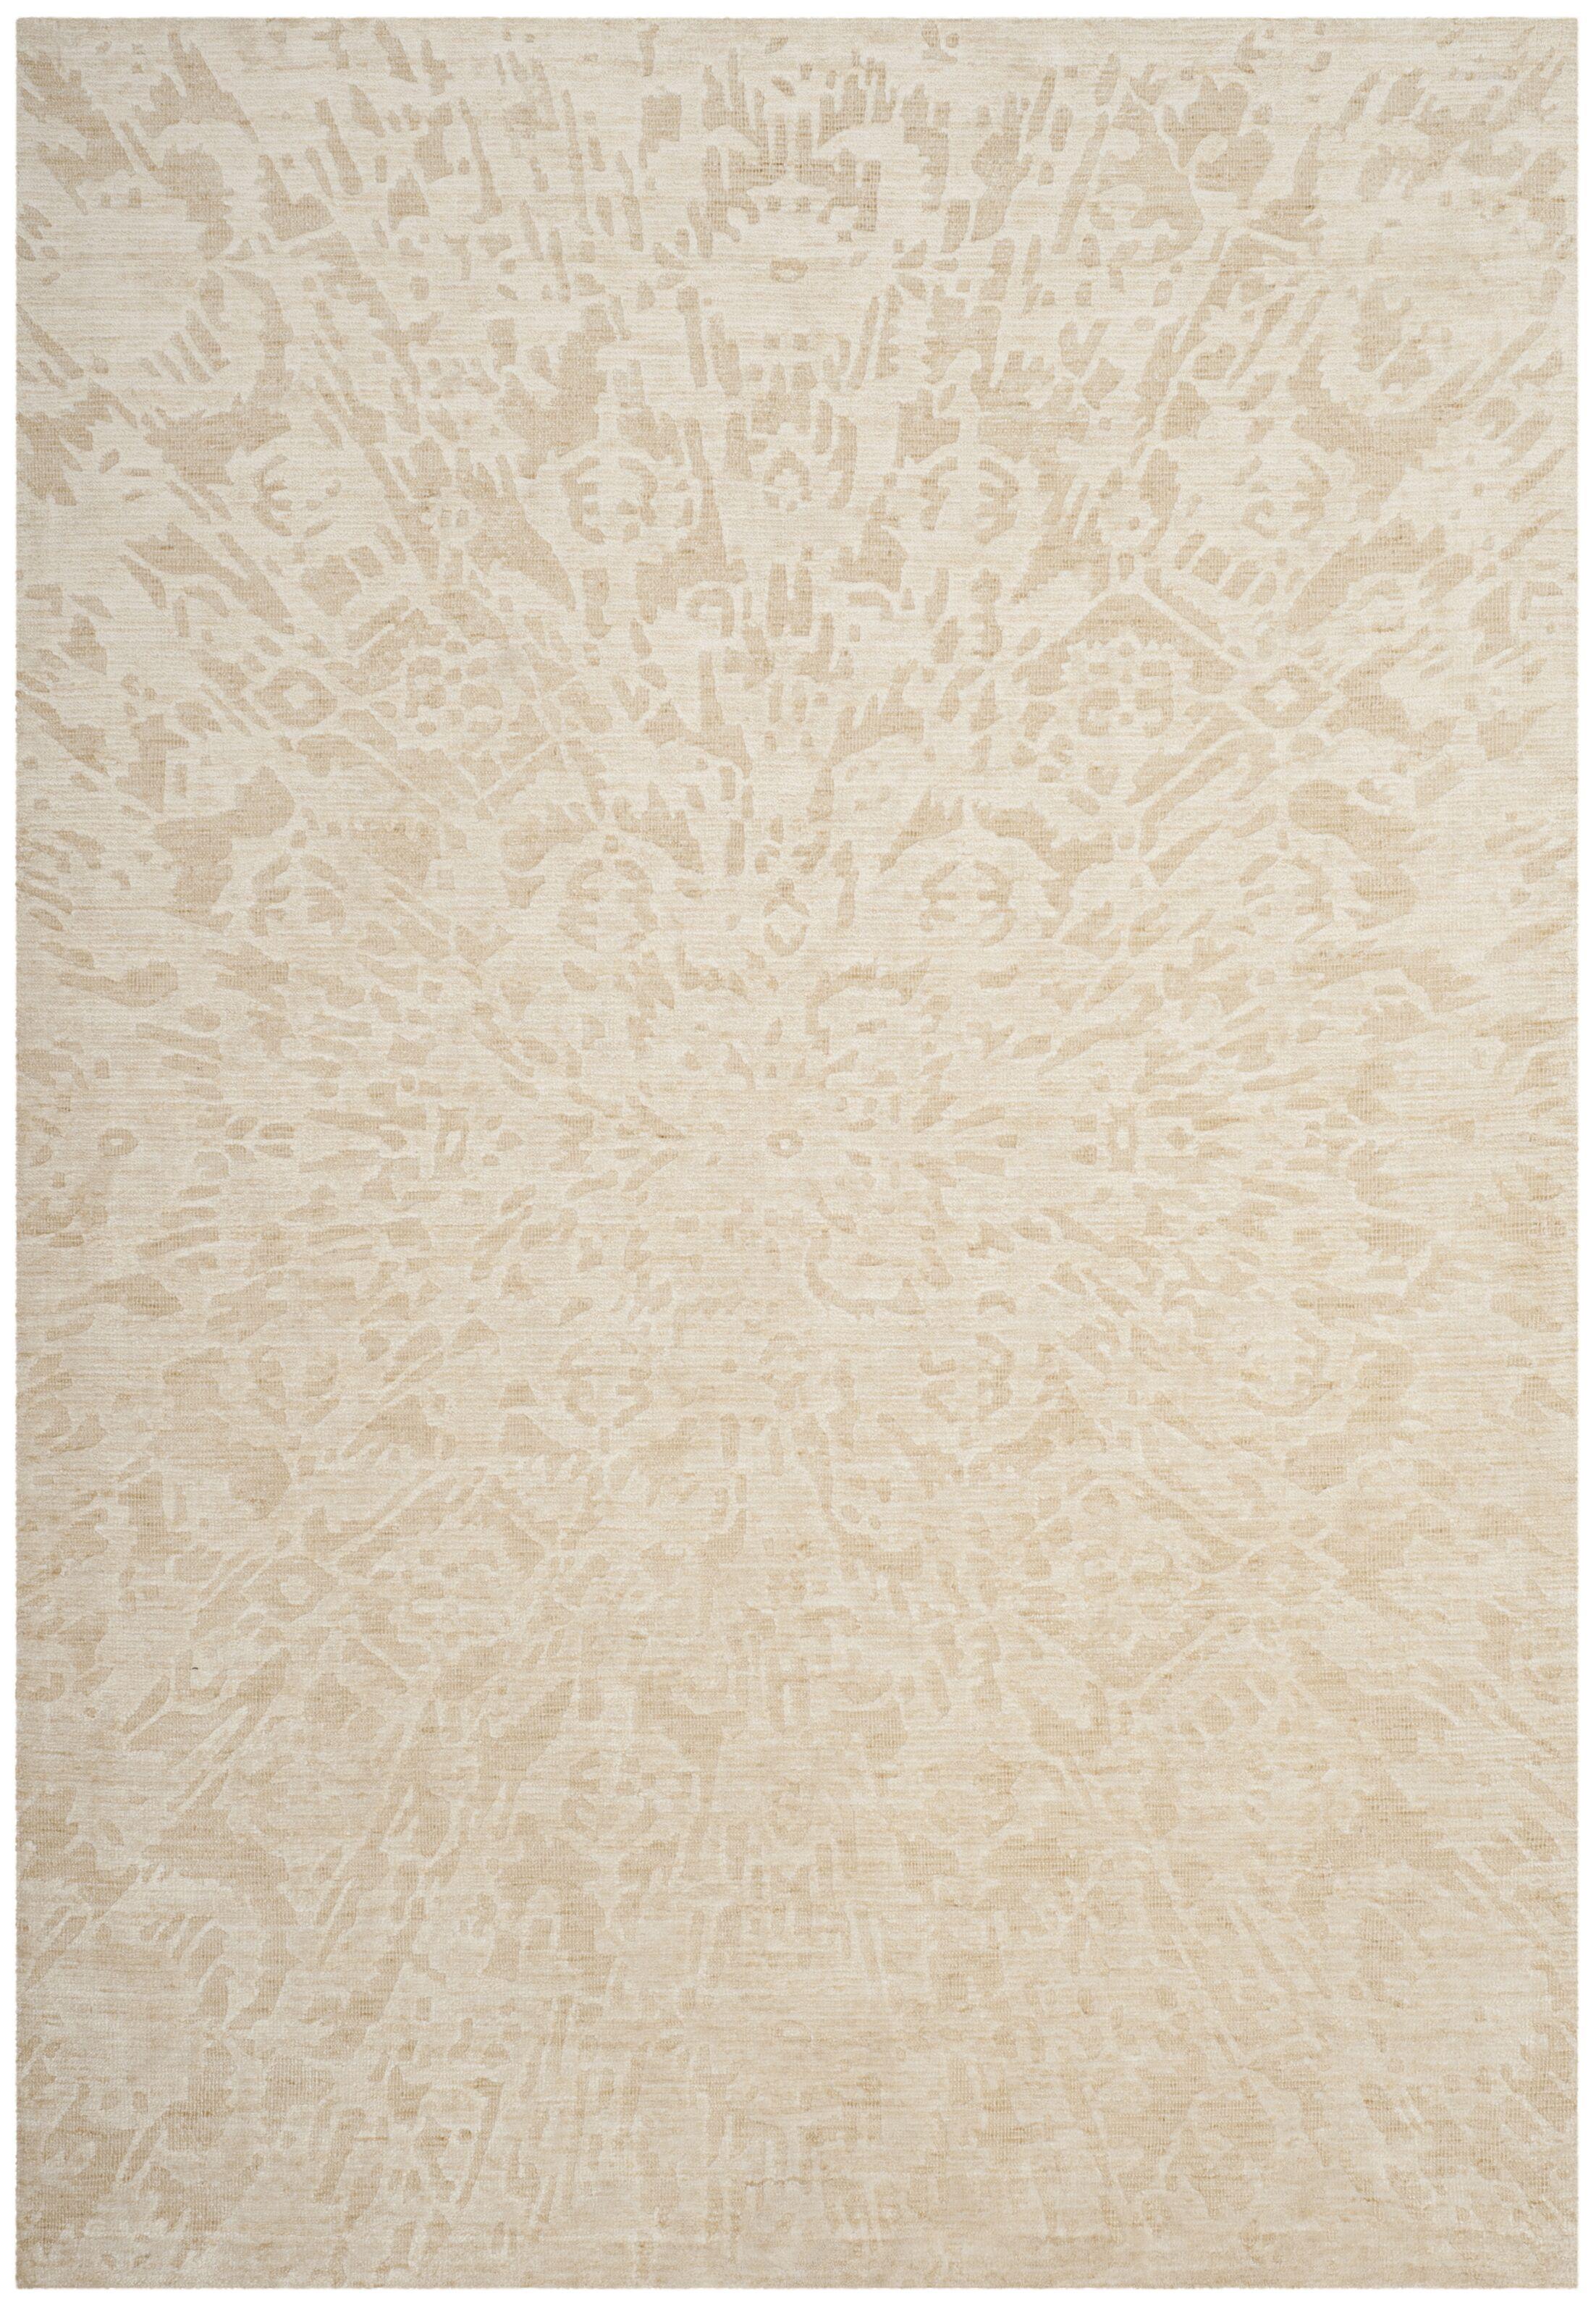 Juhi Hand Tufted Beige Area Rug Rug Size: Rectangle 5' x 8'